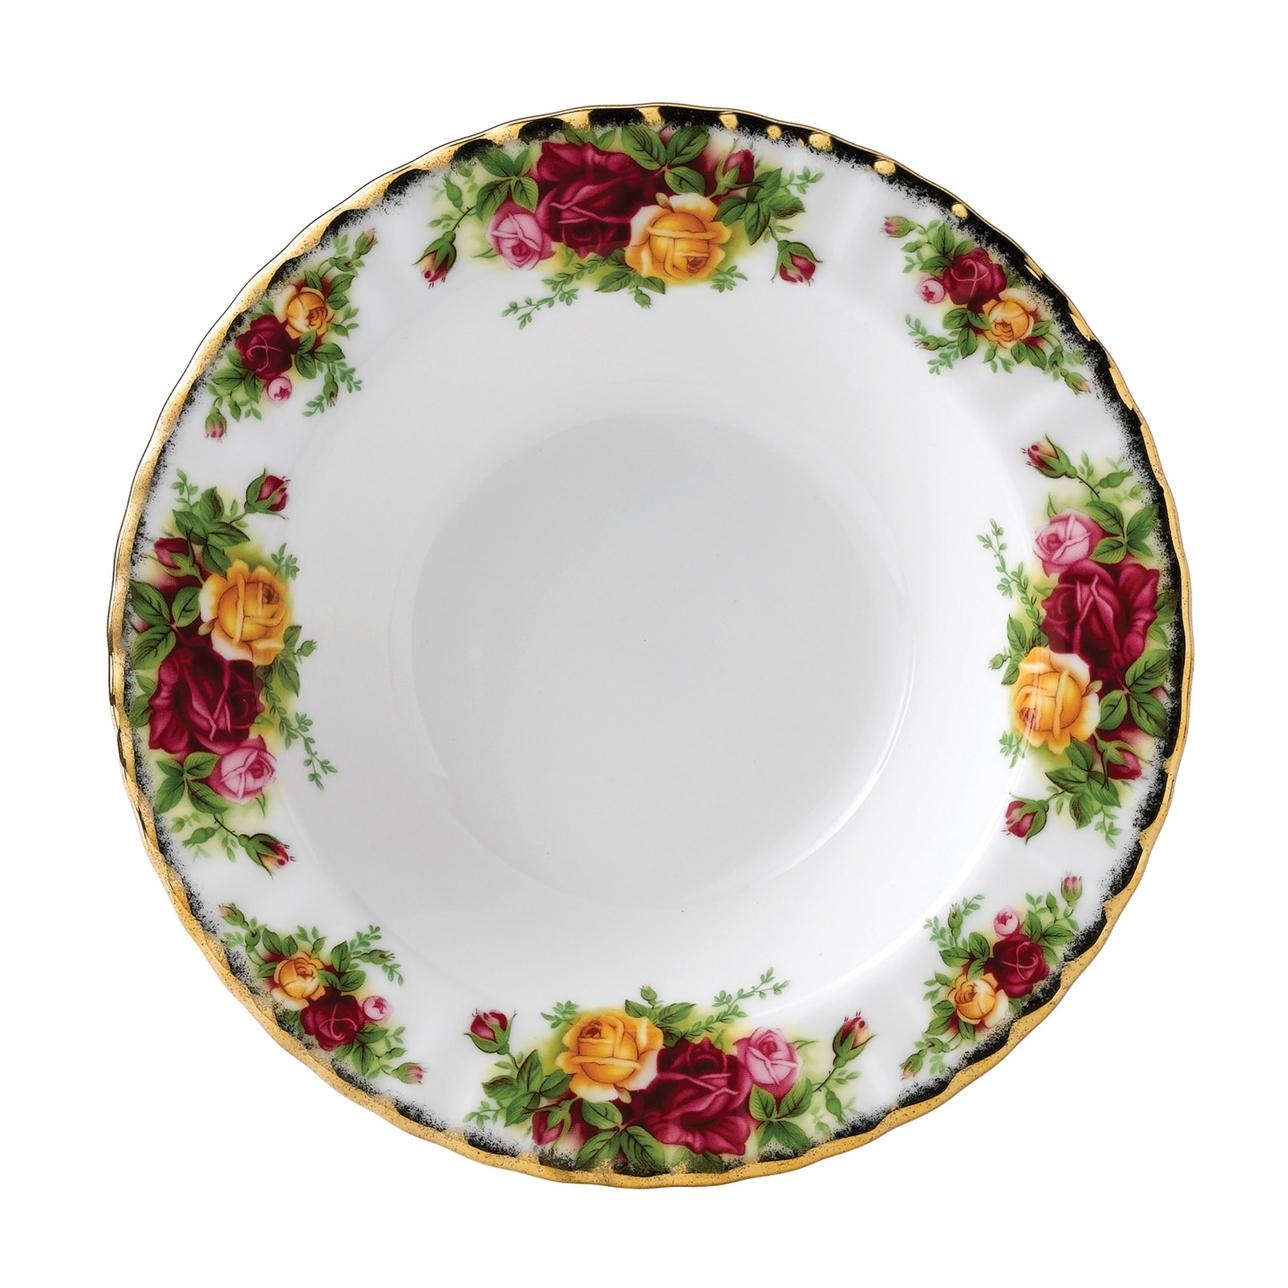 Royal Albert Old Country Roses Small Soup Bowl